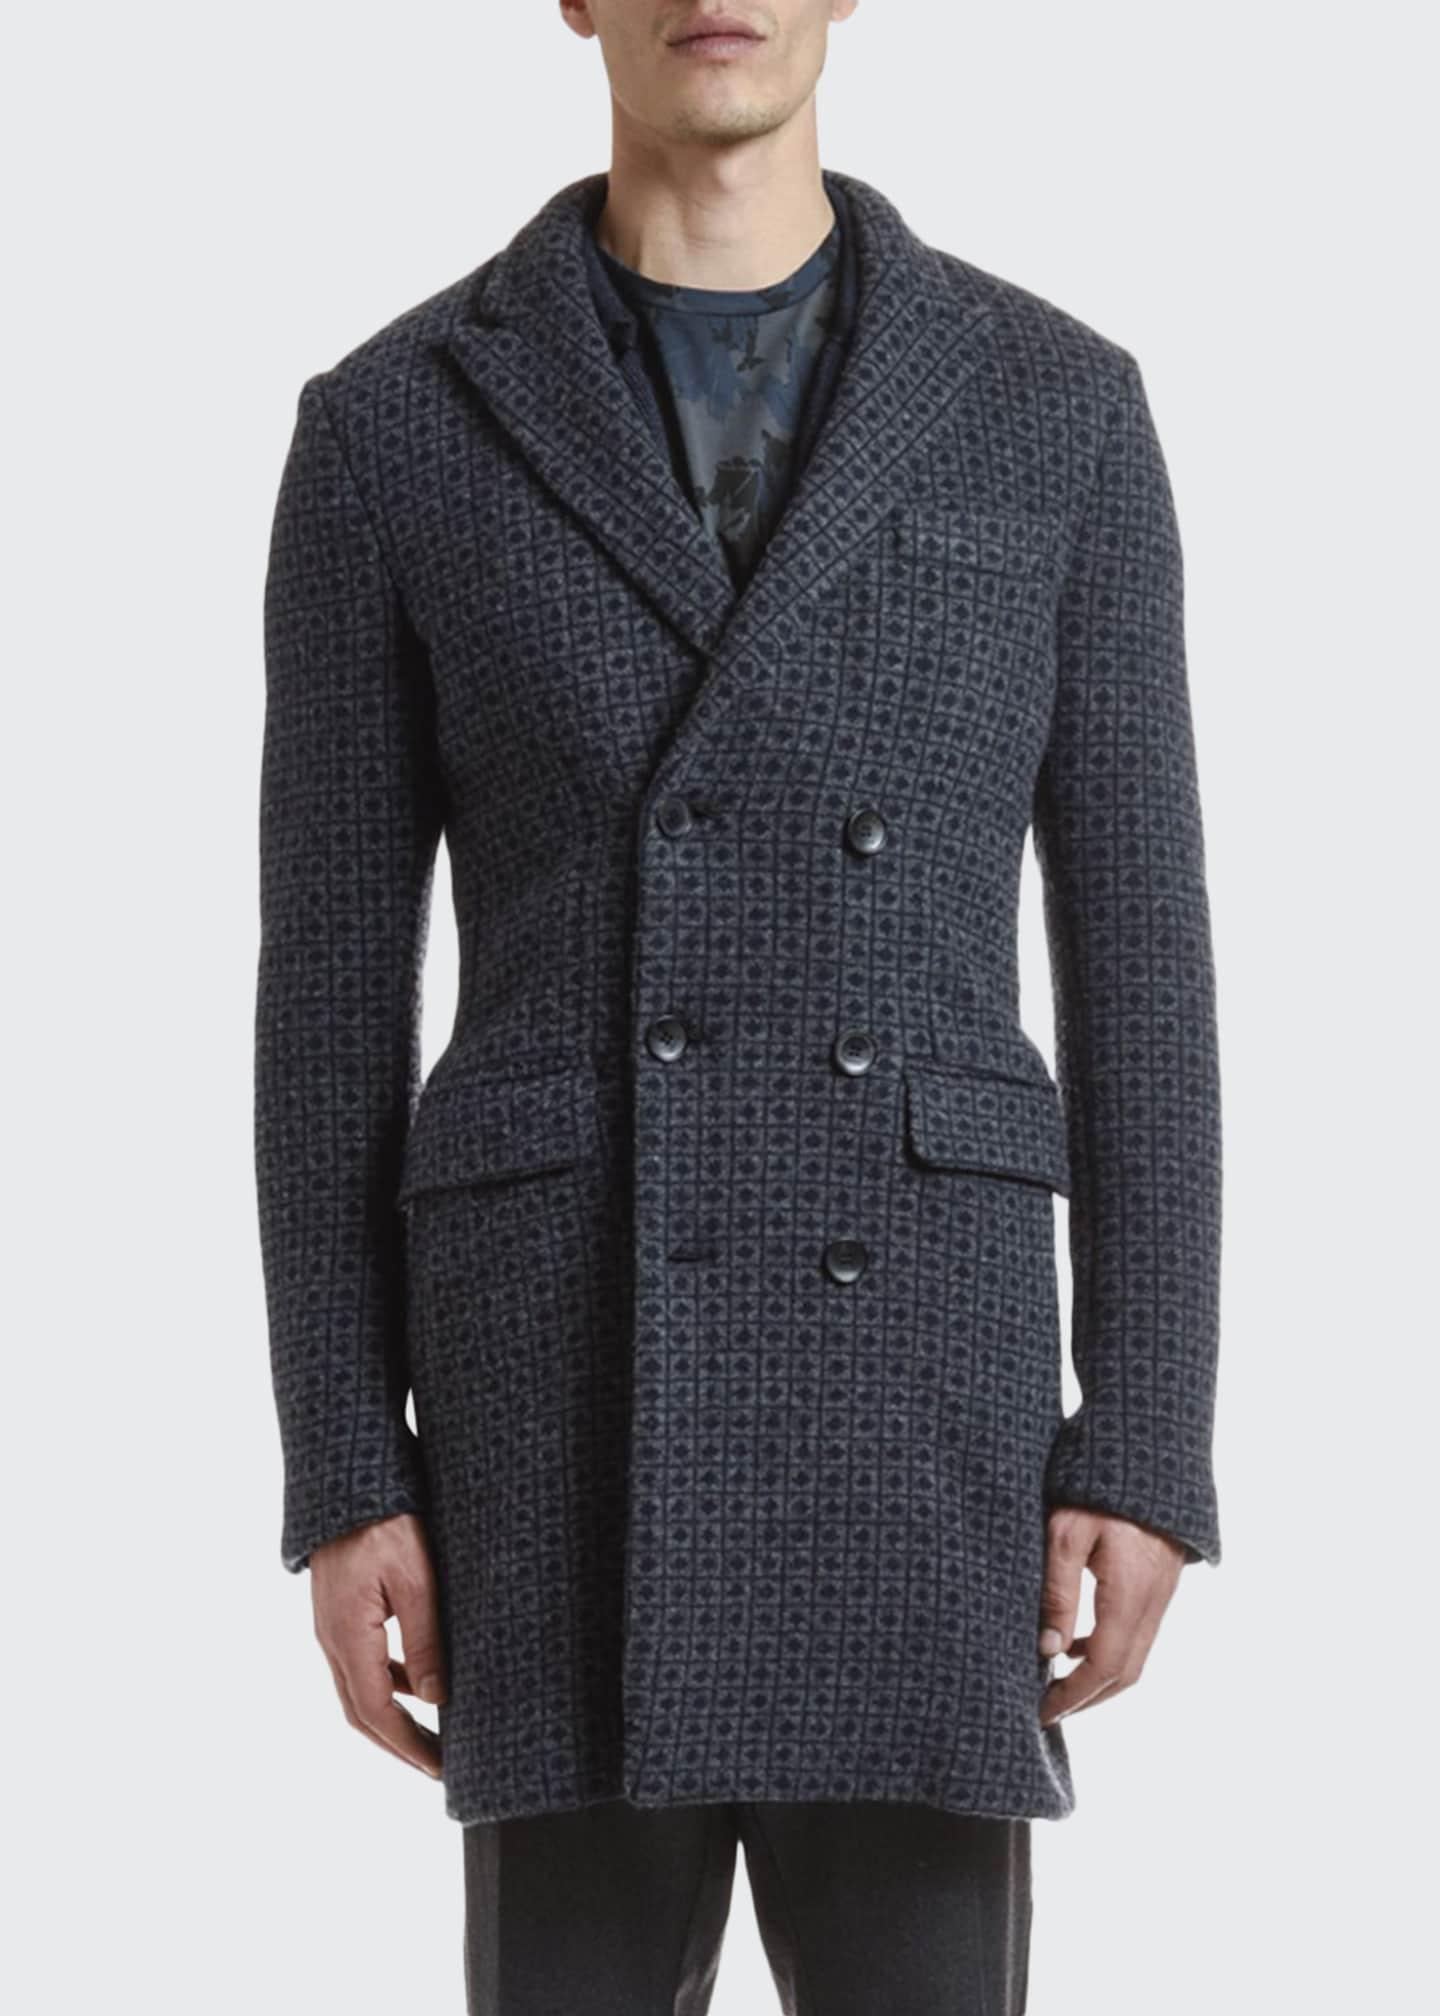 Etro Men's Medallion-Knit Wool Overcoat